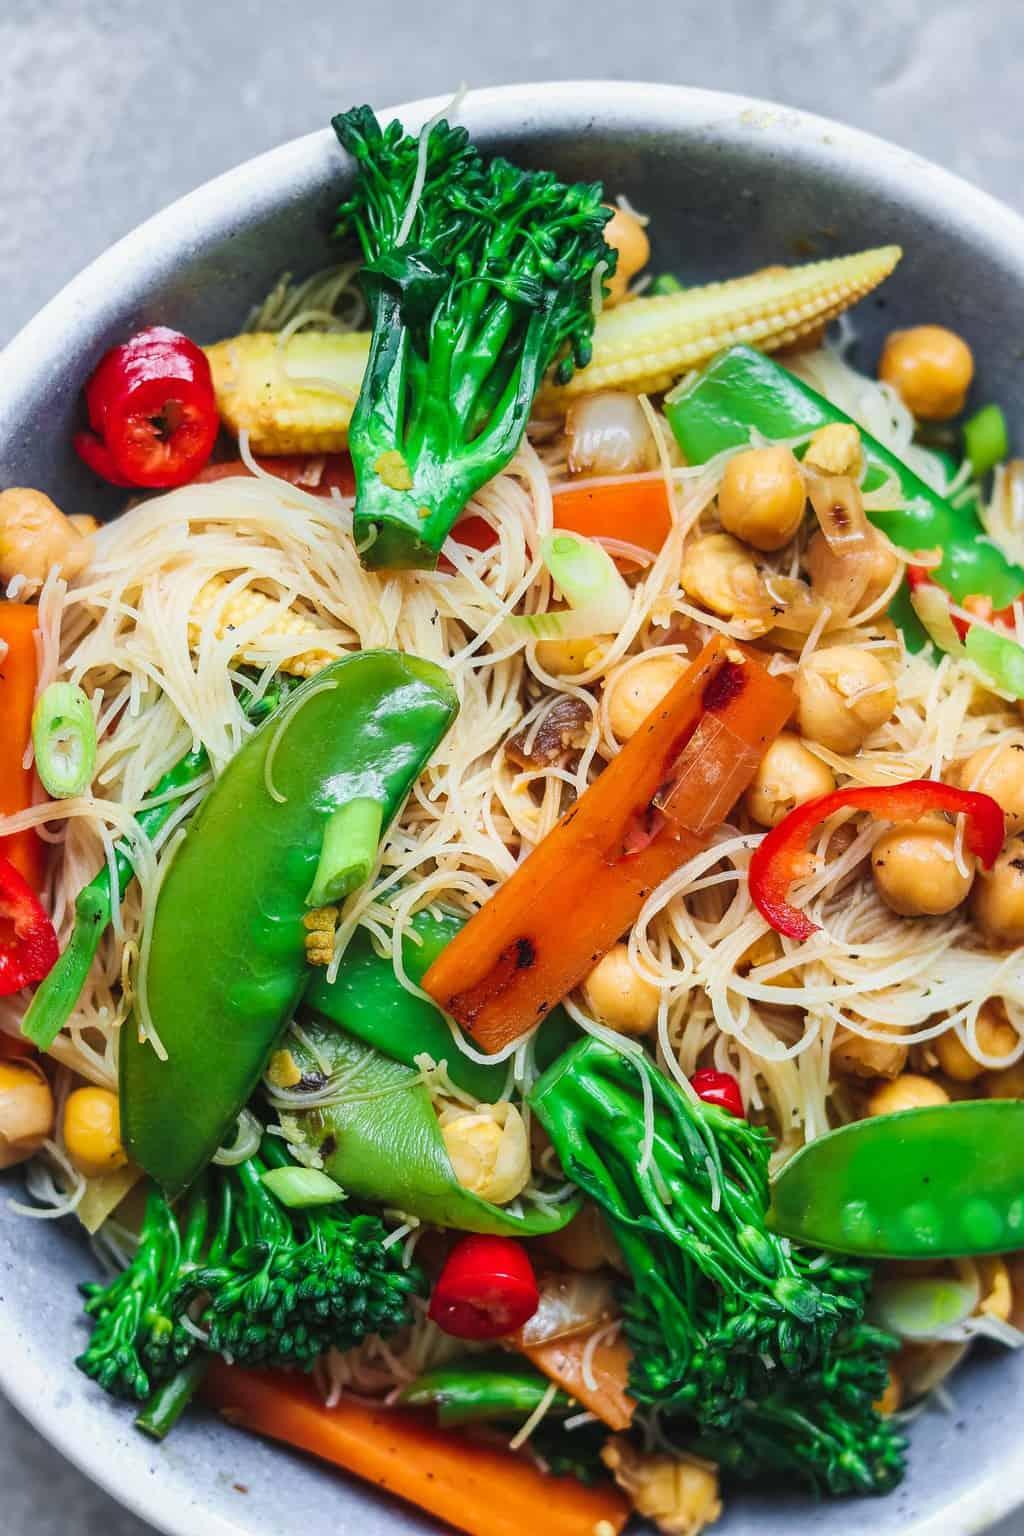 Vegan lime chickpea stir-fry